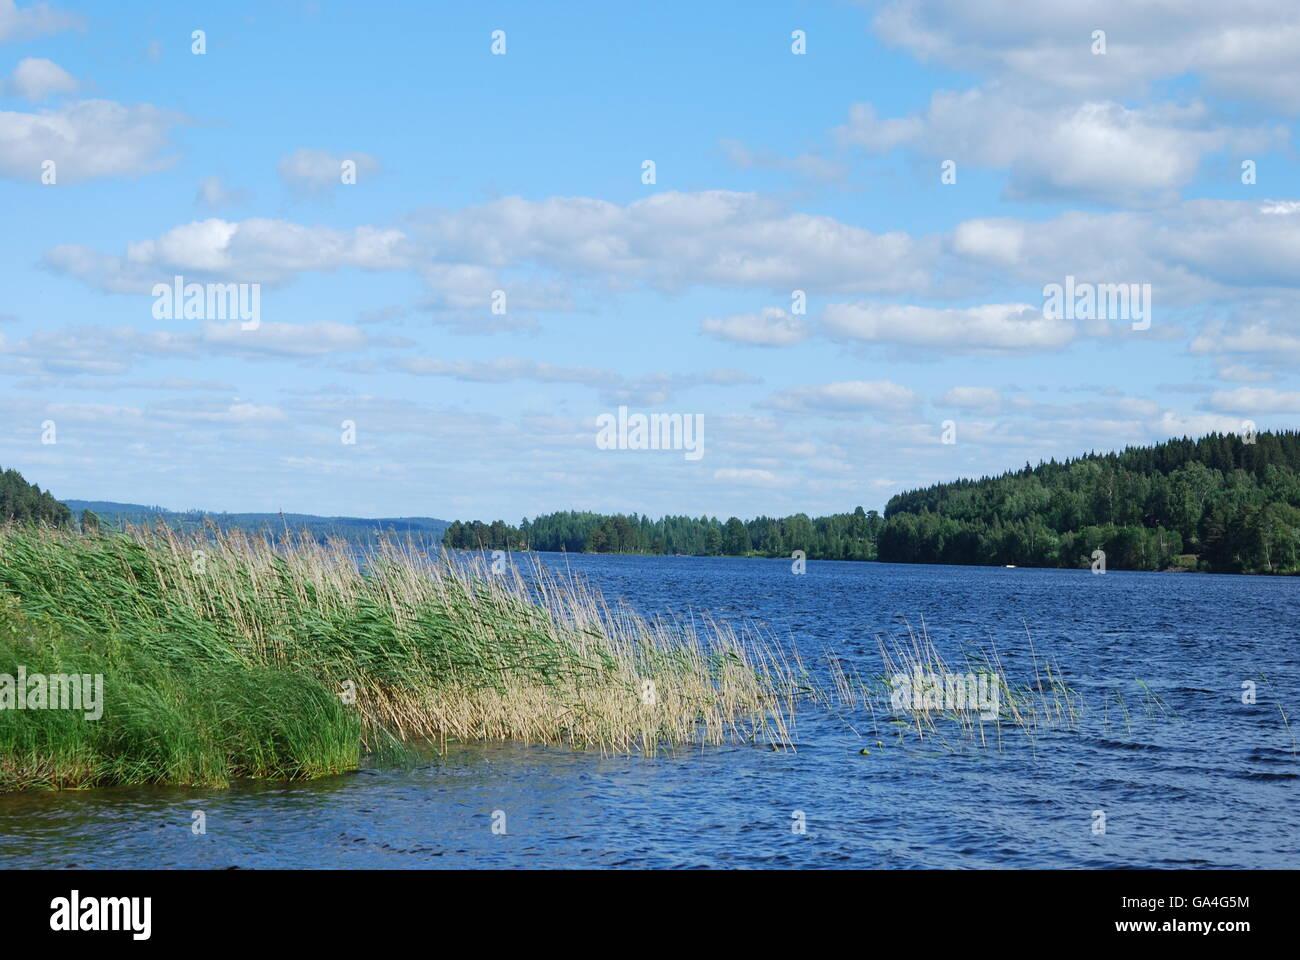 Swedish lake in summer - Stock Image